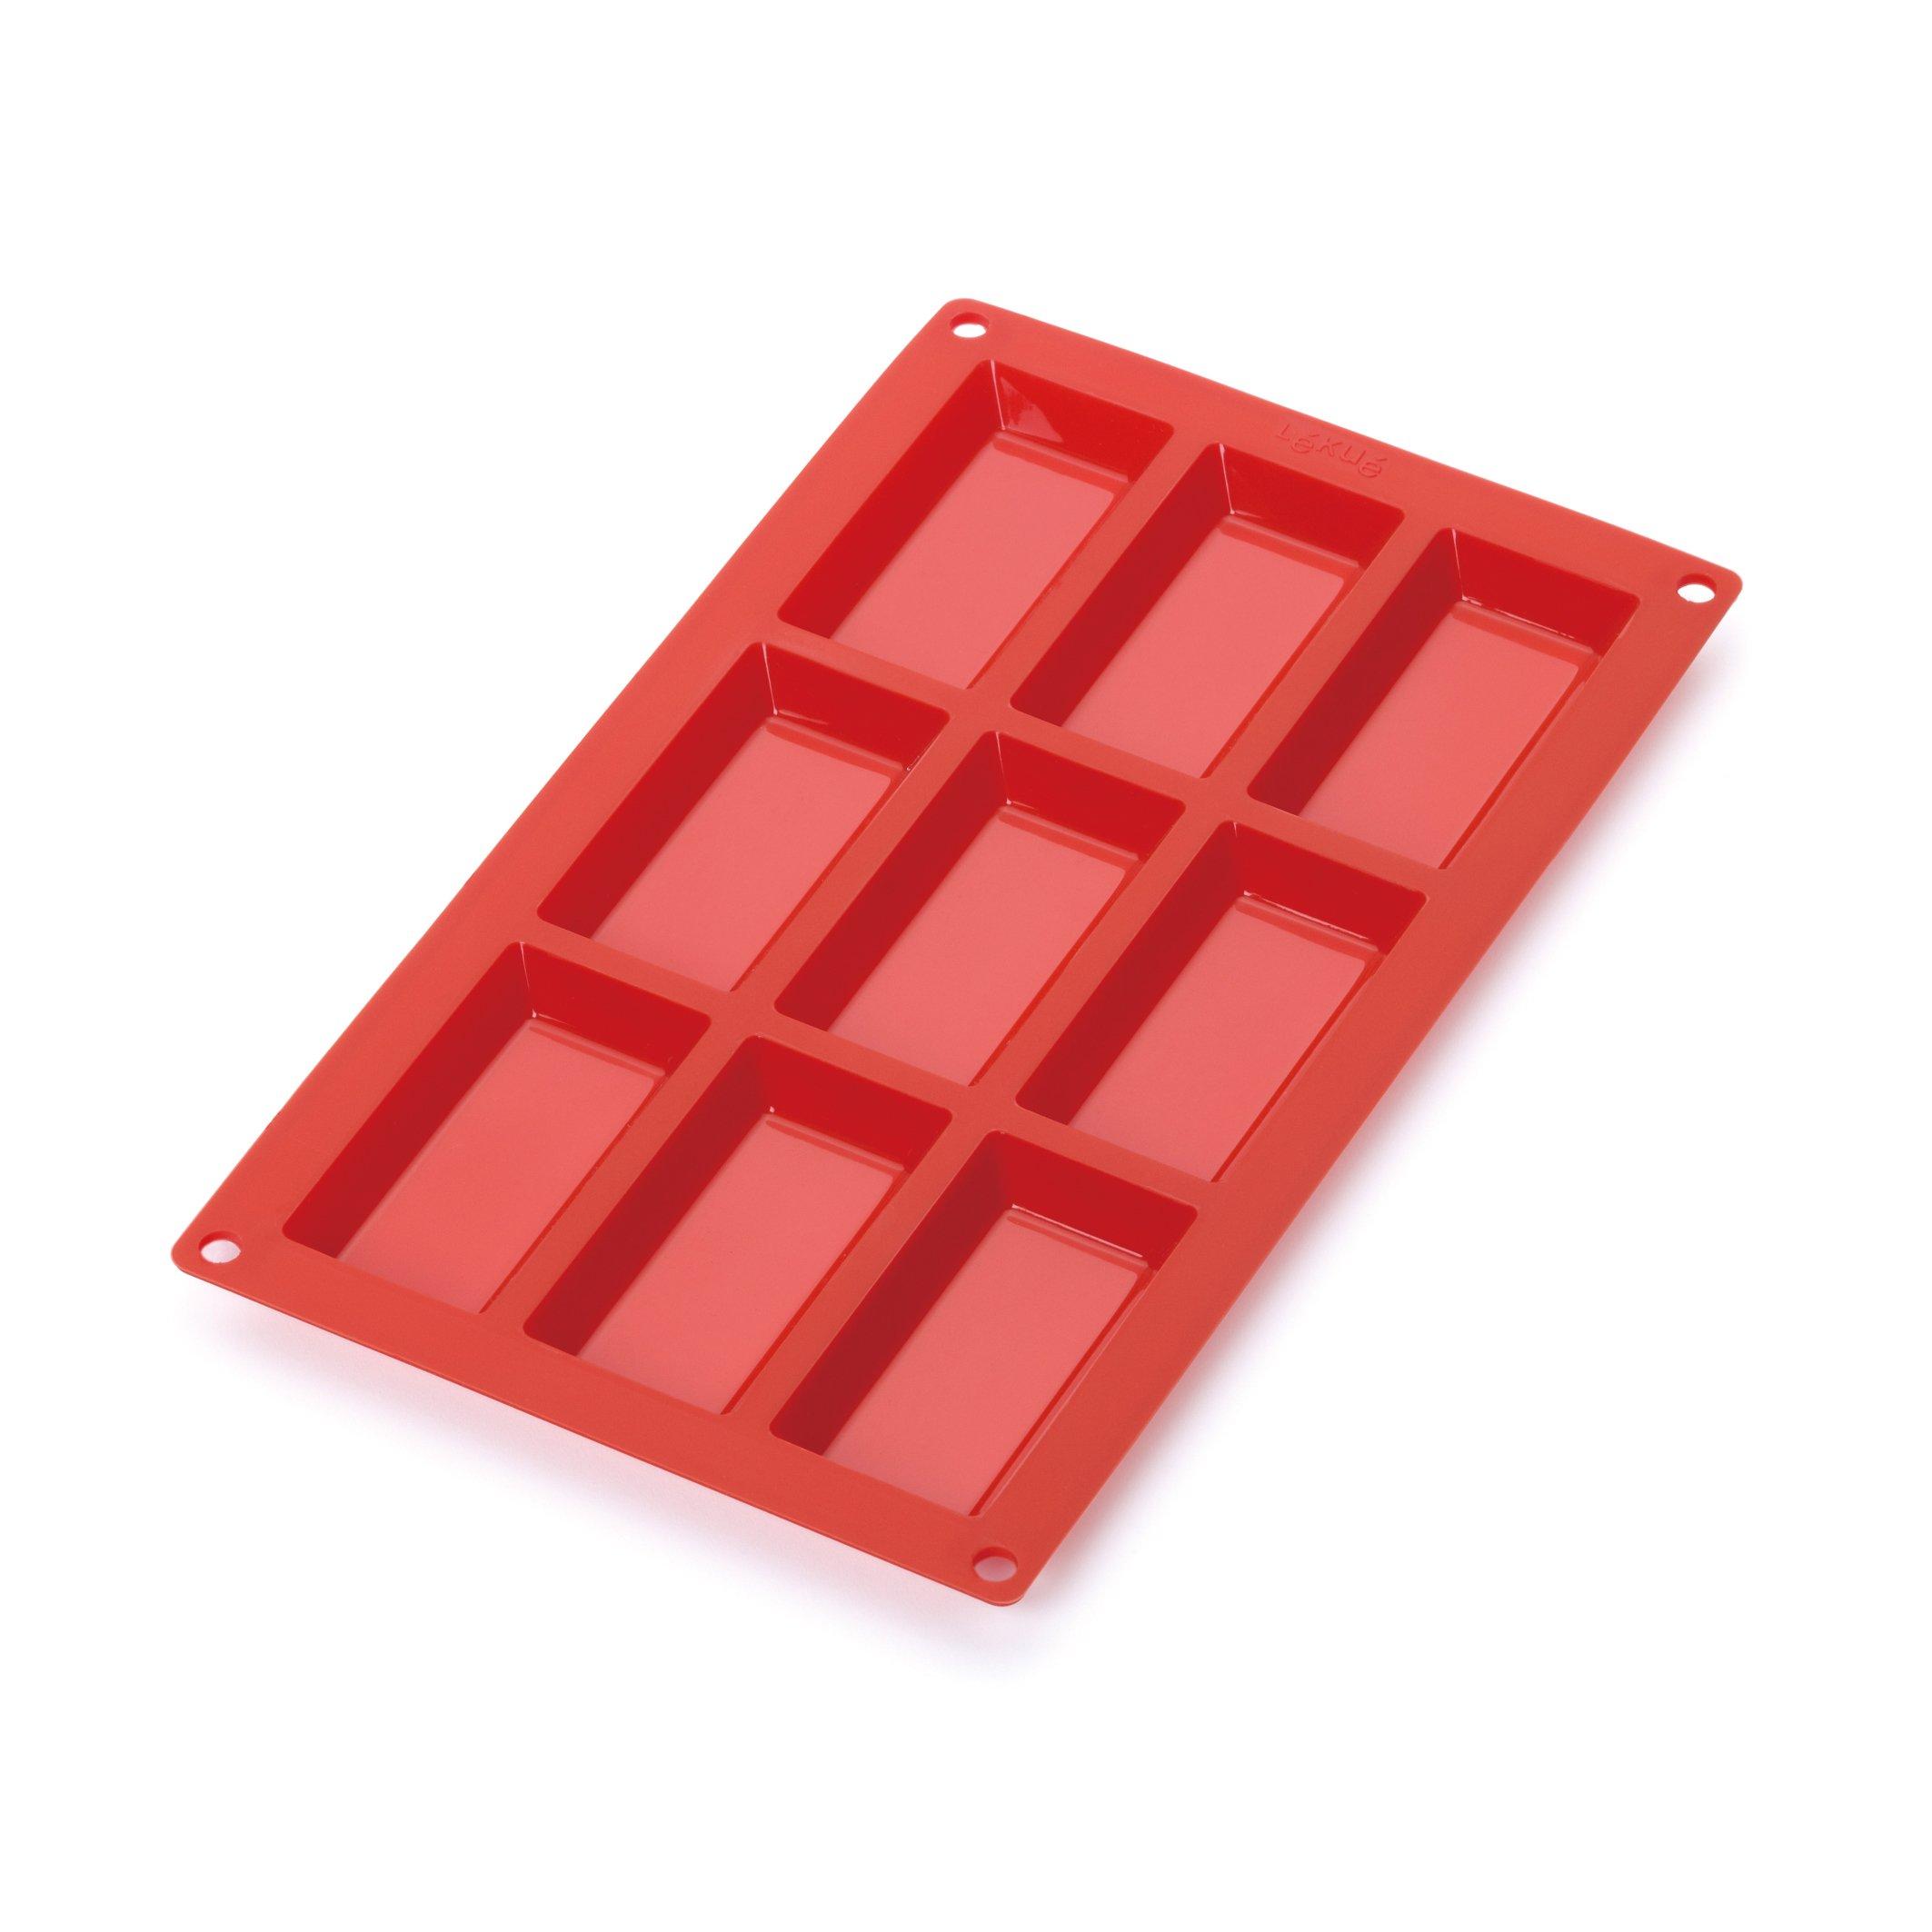 Lekue 9 Cavities Financier Multi Cavity Baking Mold, Red